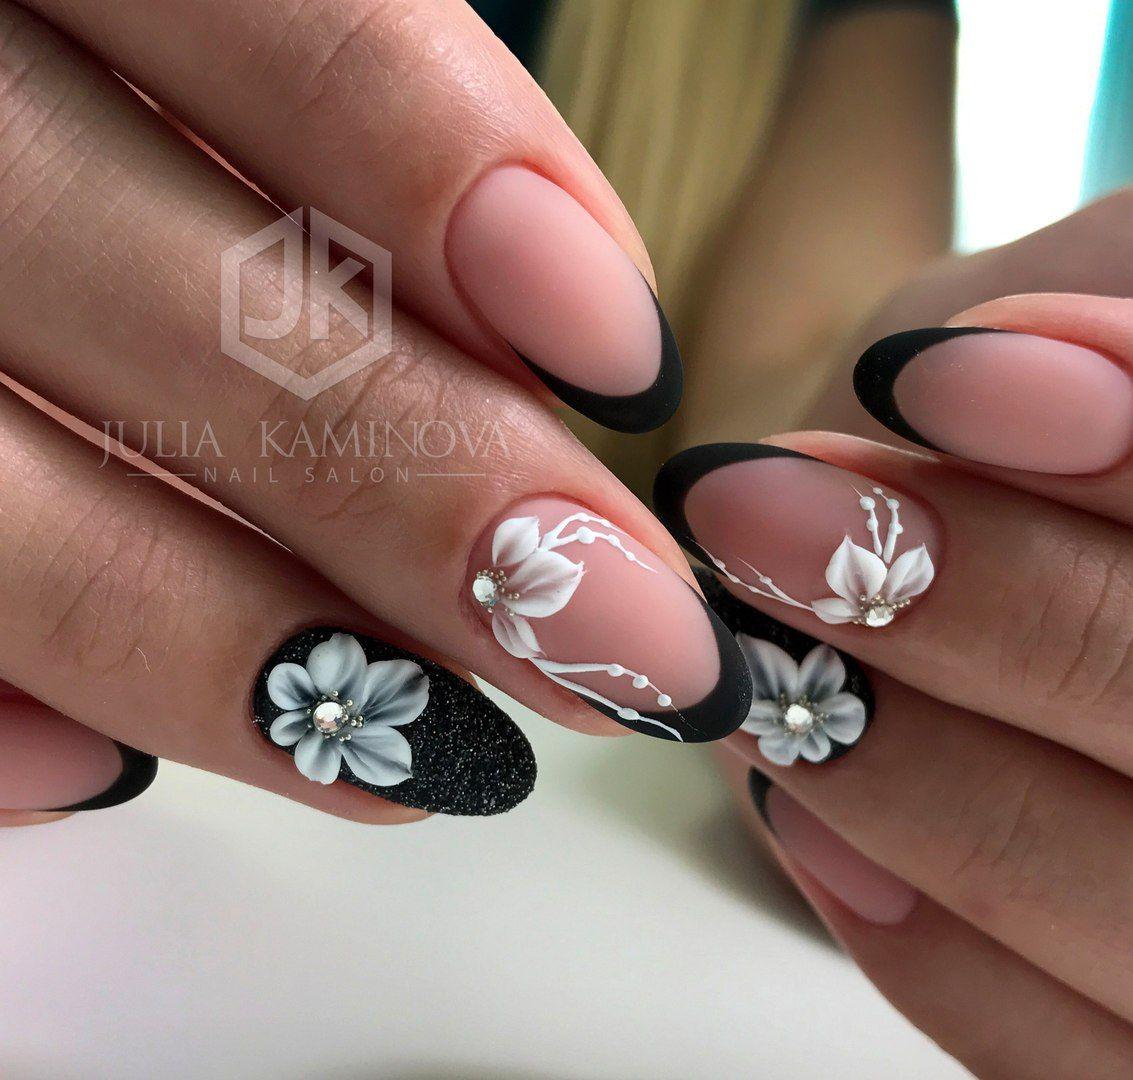 Fiori Unghie.Unghie E Fiori 3d Nails Flower Nails Stiletto Nails Designs